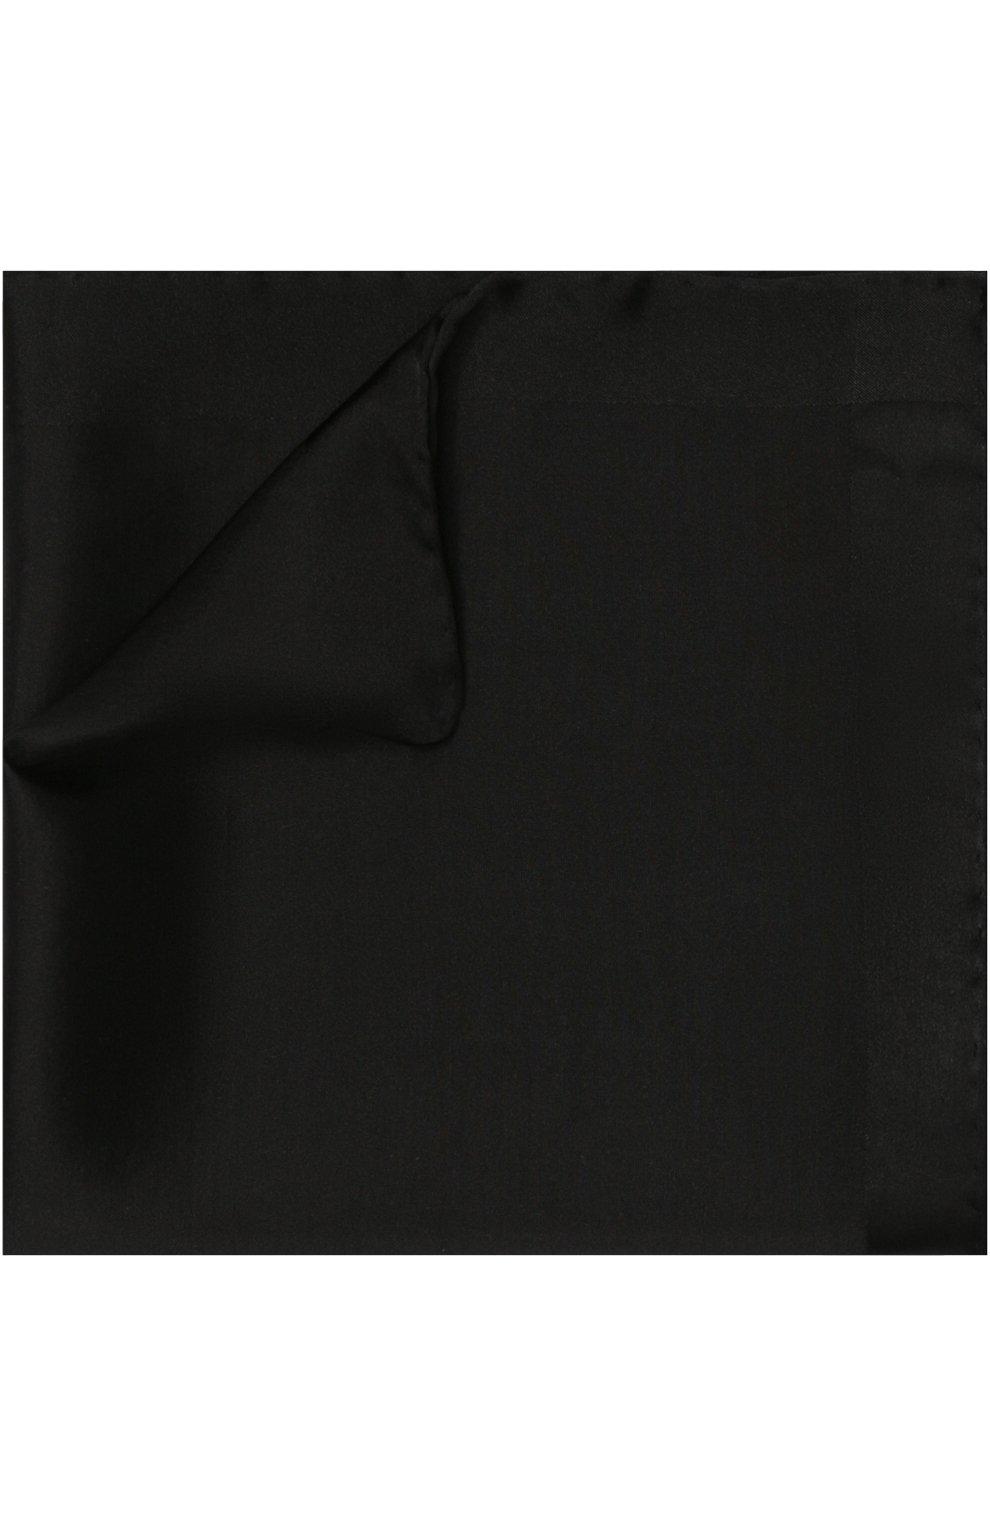 Мужской шелковый платок TOM FORD черного цвета, арт. 4TF86/TF312   Фото 1